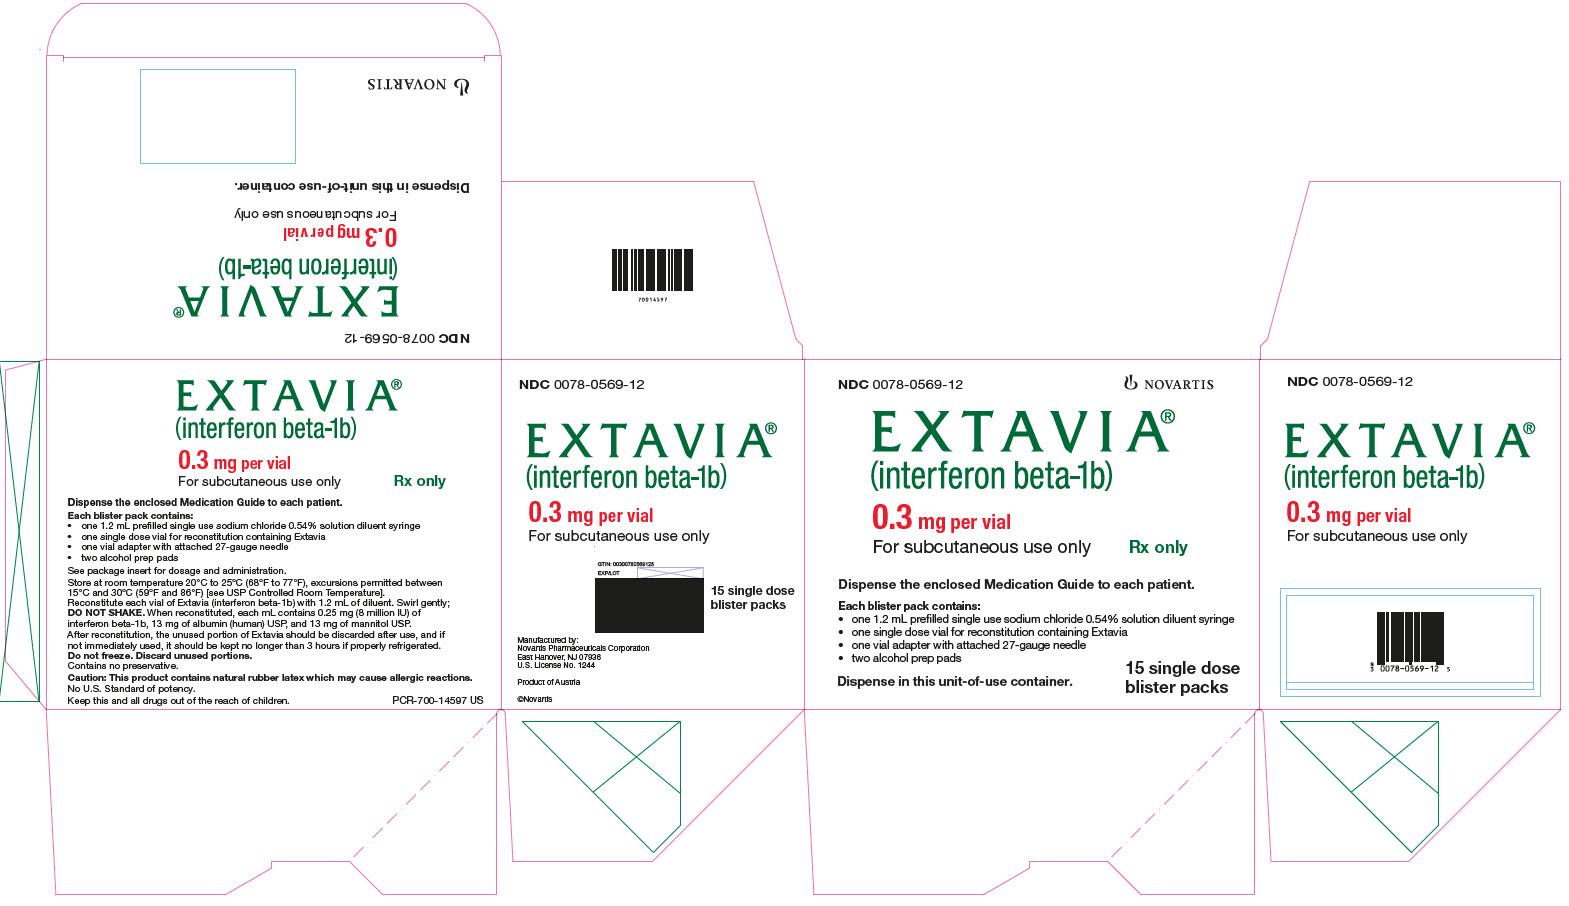 Extavia (Interferon Beta-1b) Kit [Novartis Pharmaceuticals Corporation]